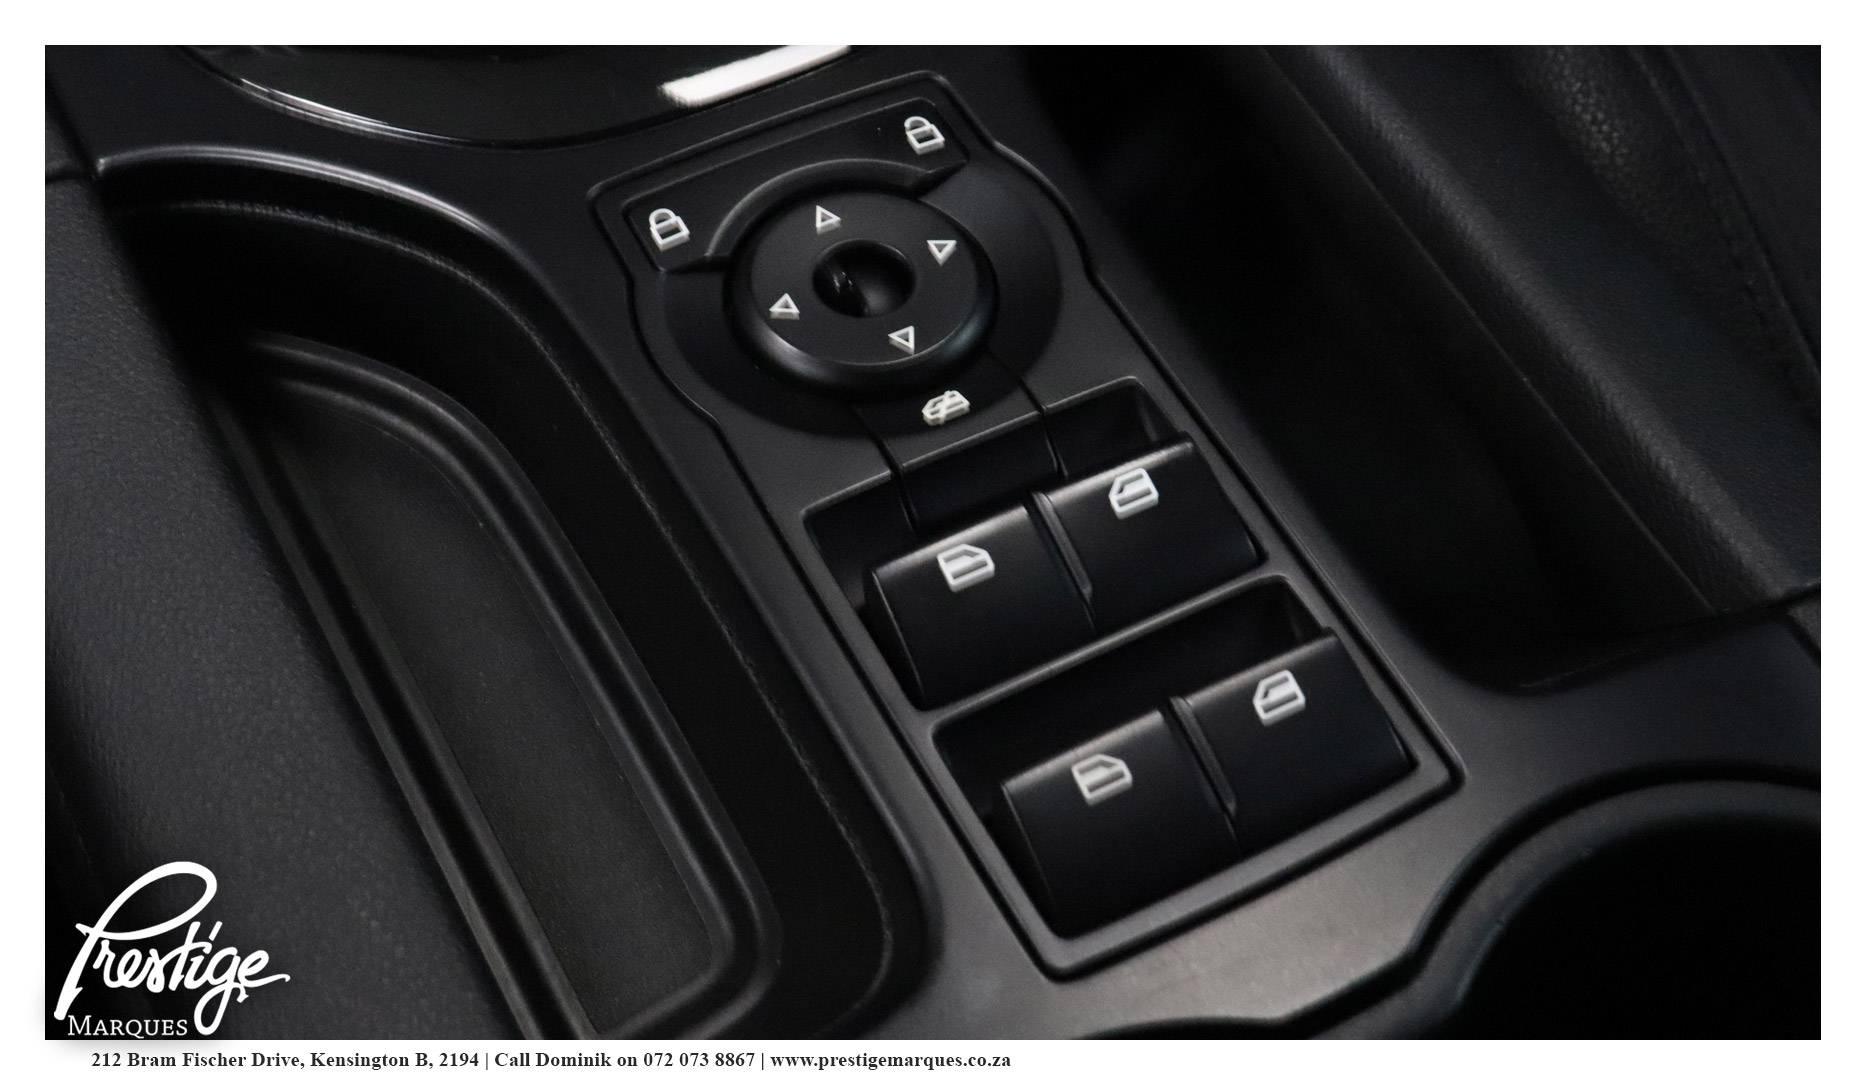 2008-Chevrolet-Lumina-SS-5.4-Manual-Prestige-Marques-Randburg-Sandton-18